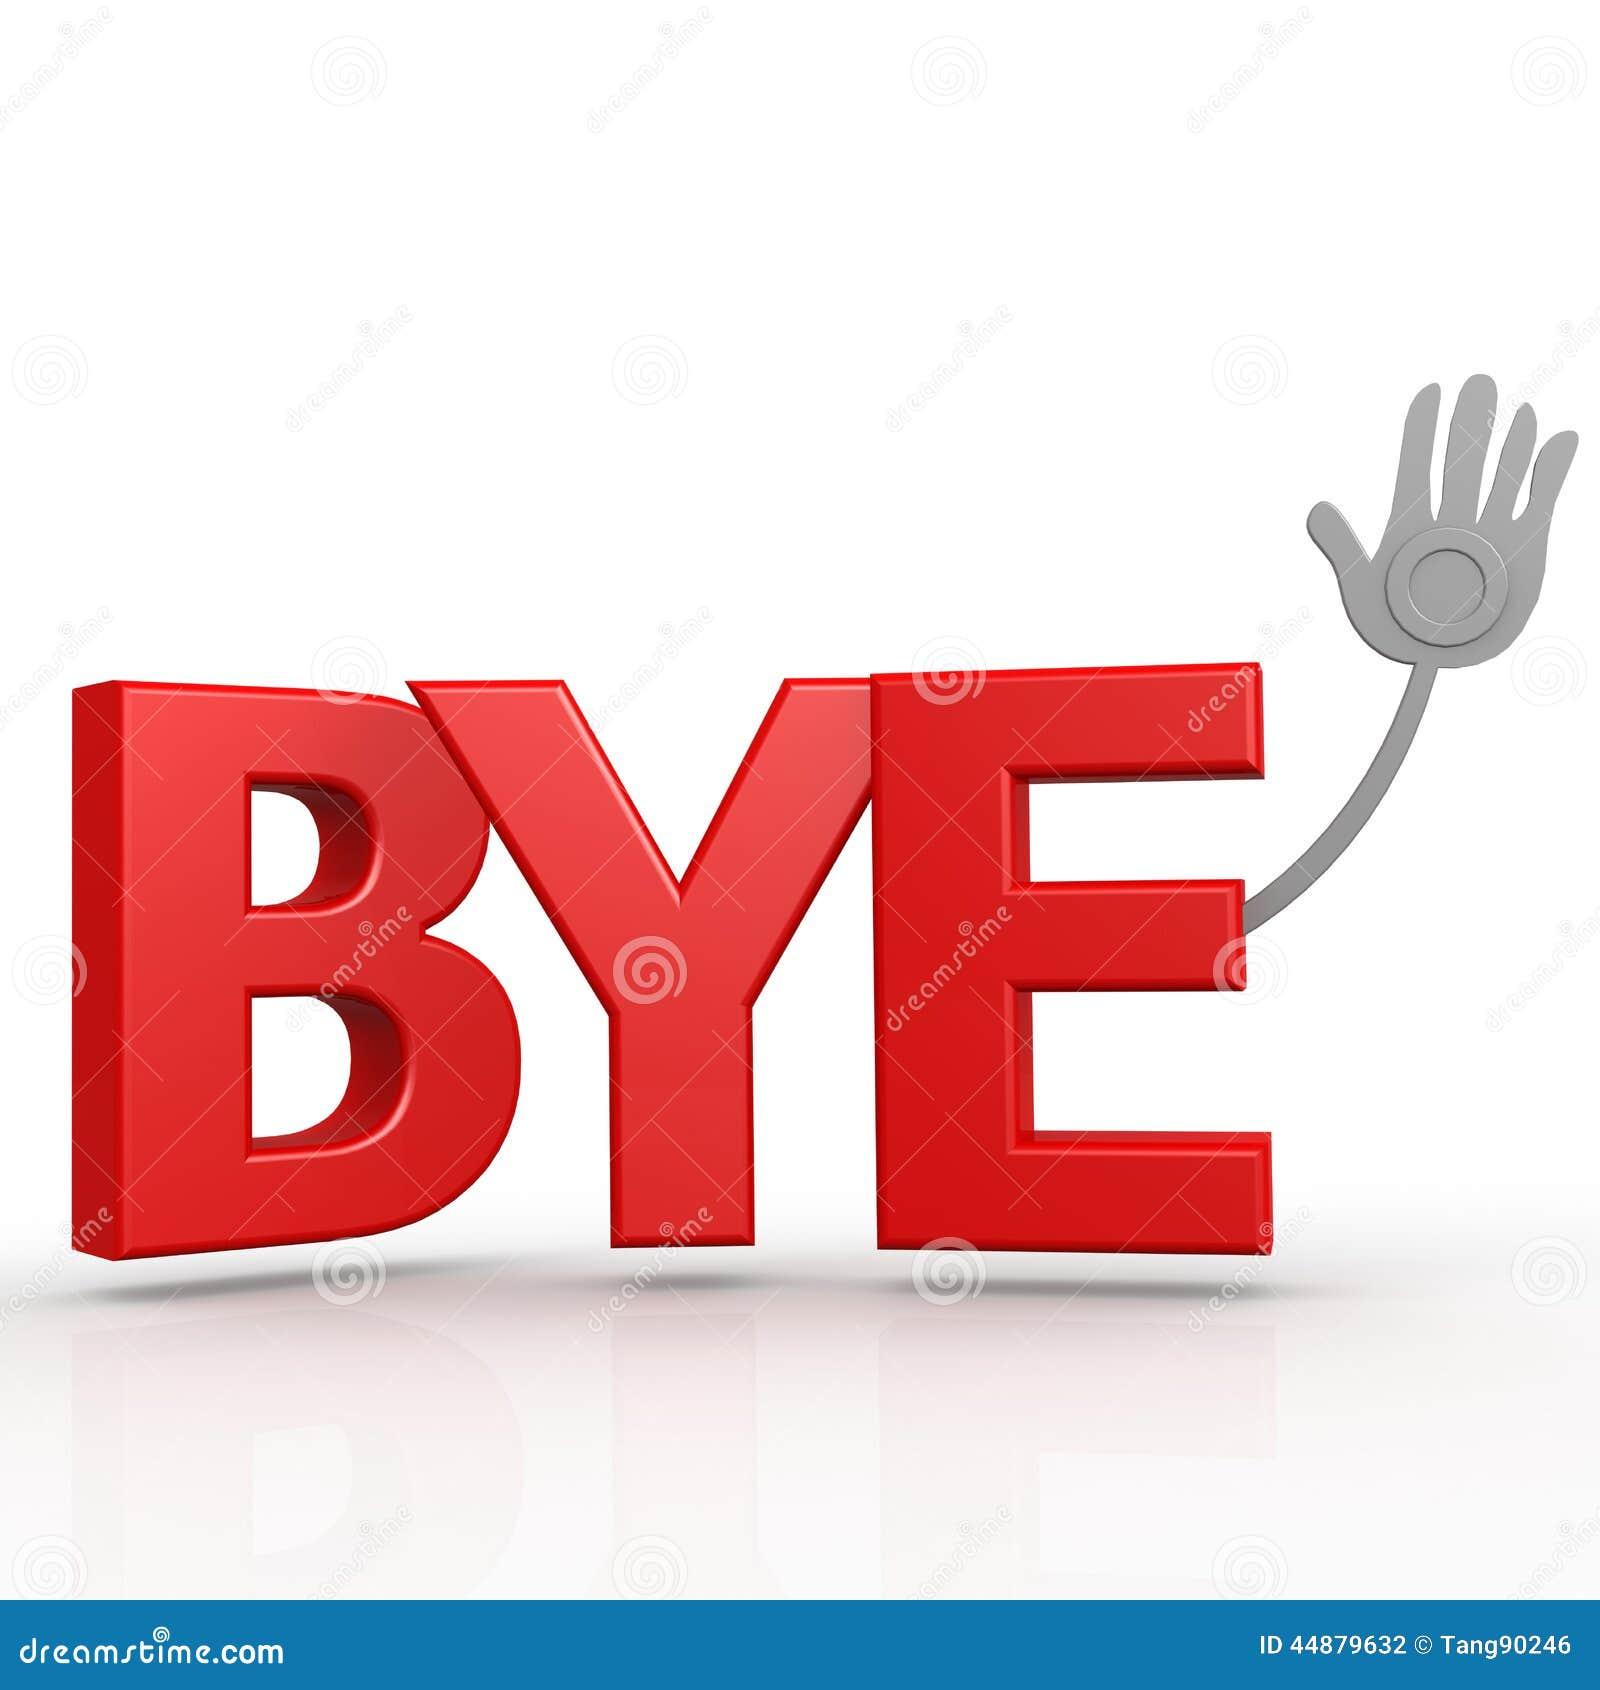 bye word stock illustration illustration of used greeting 44879632